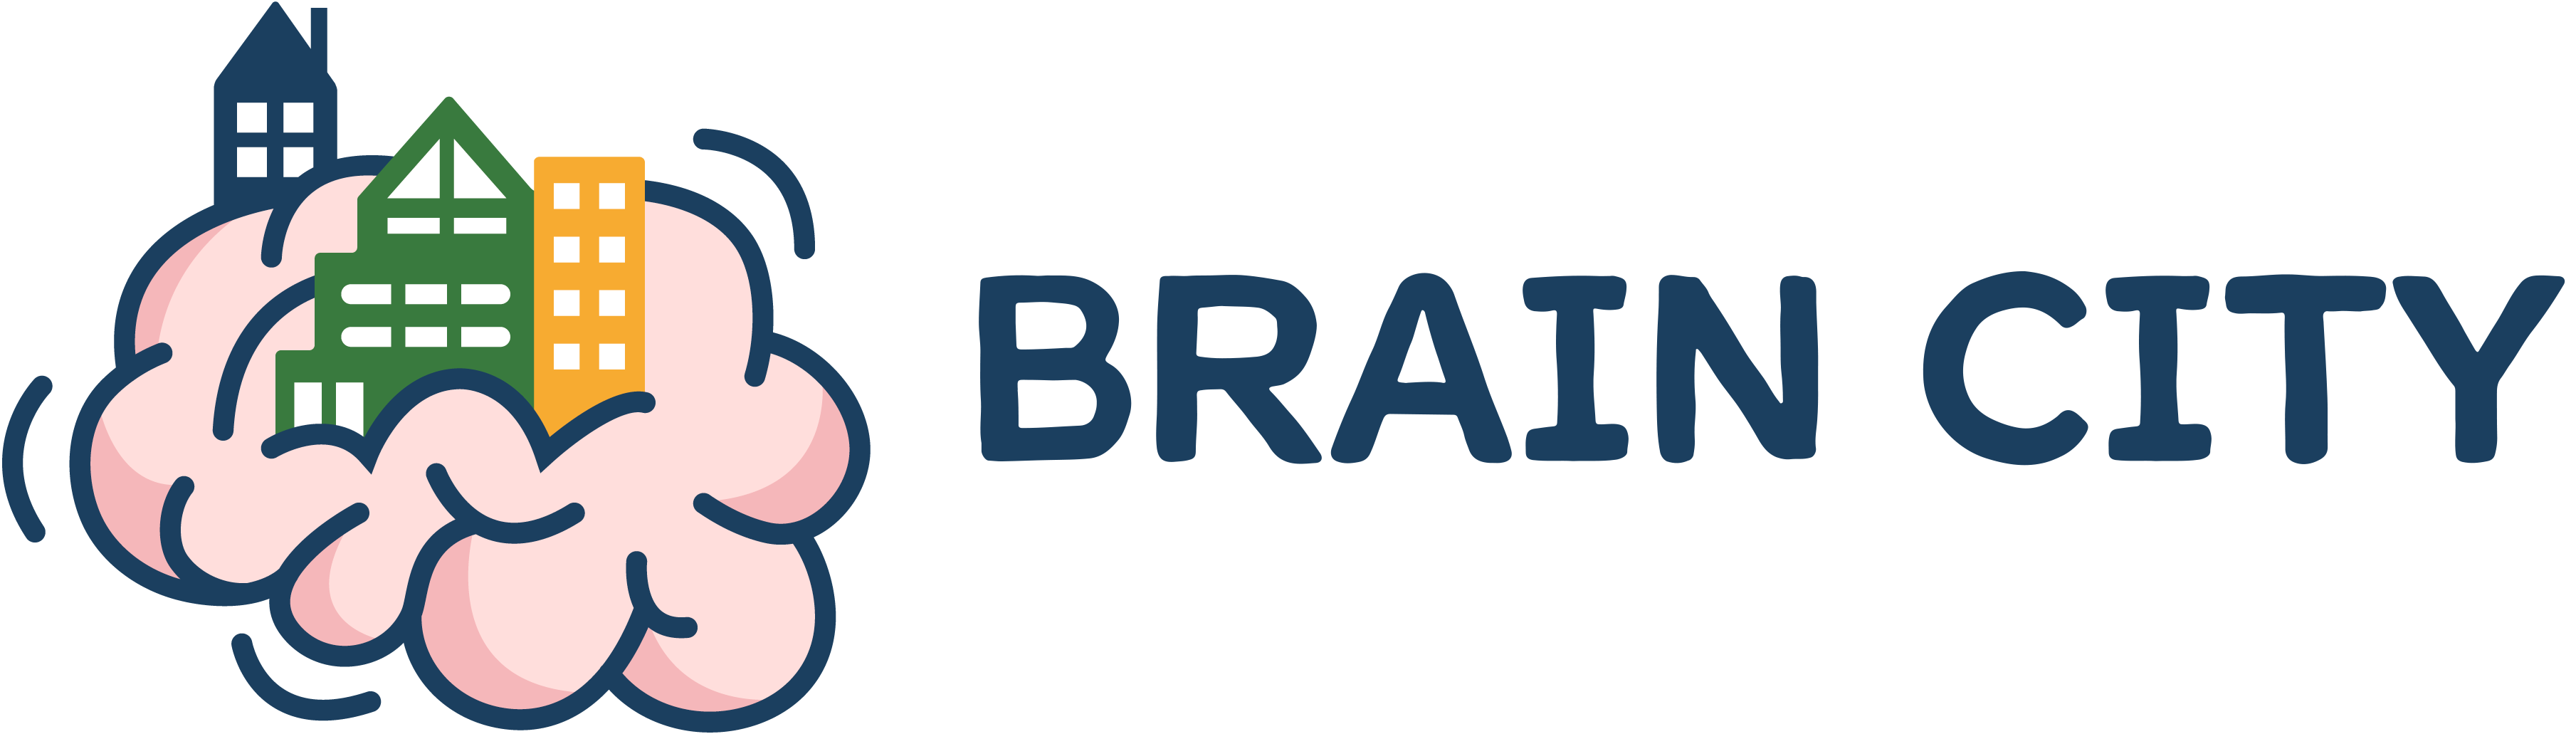 Brain City